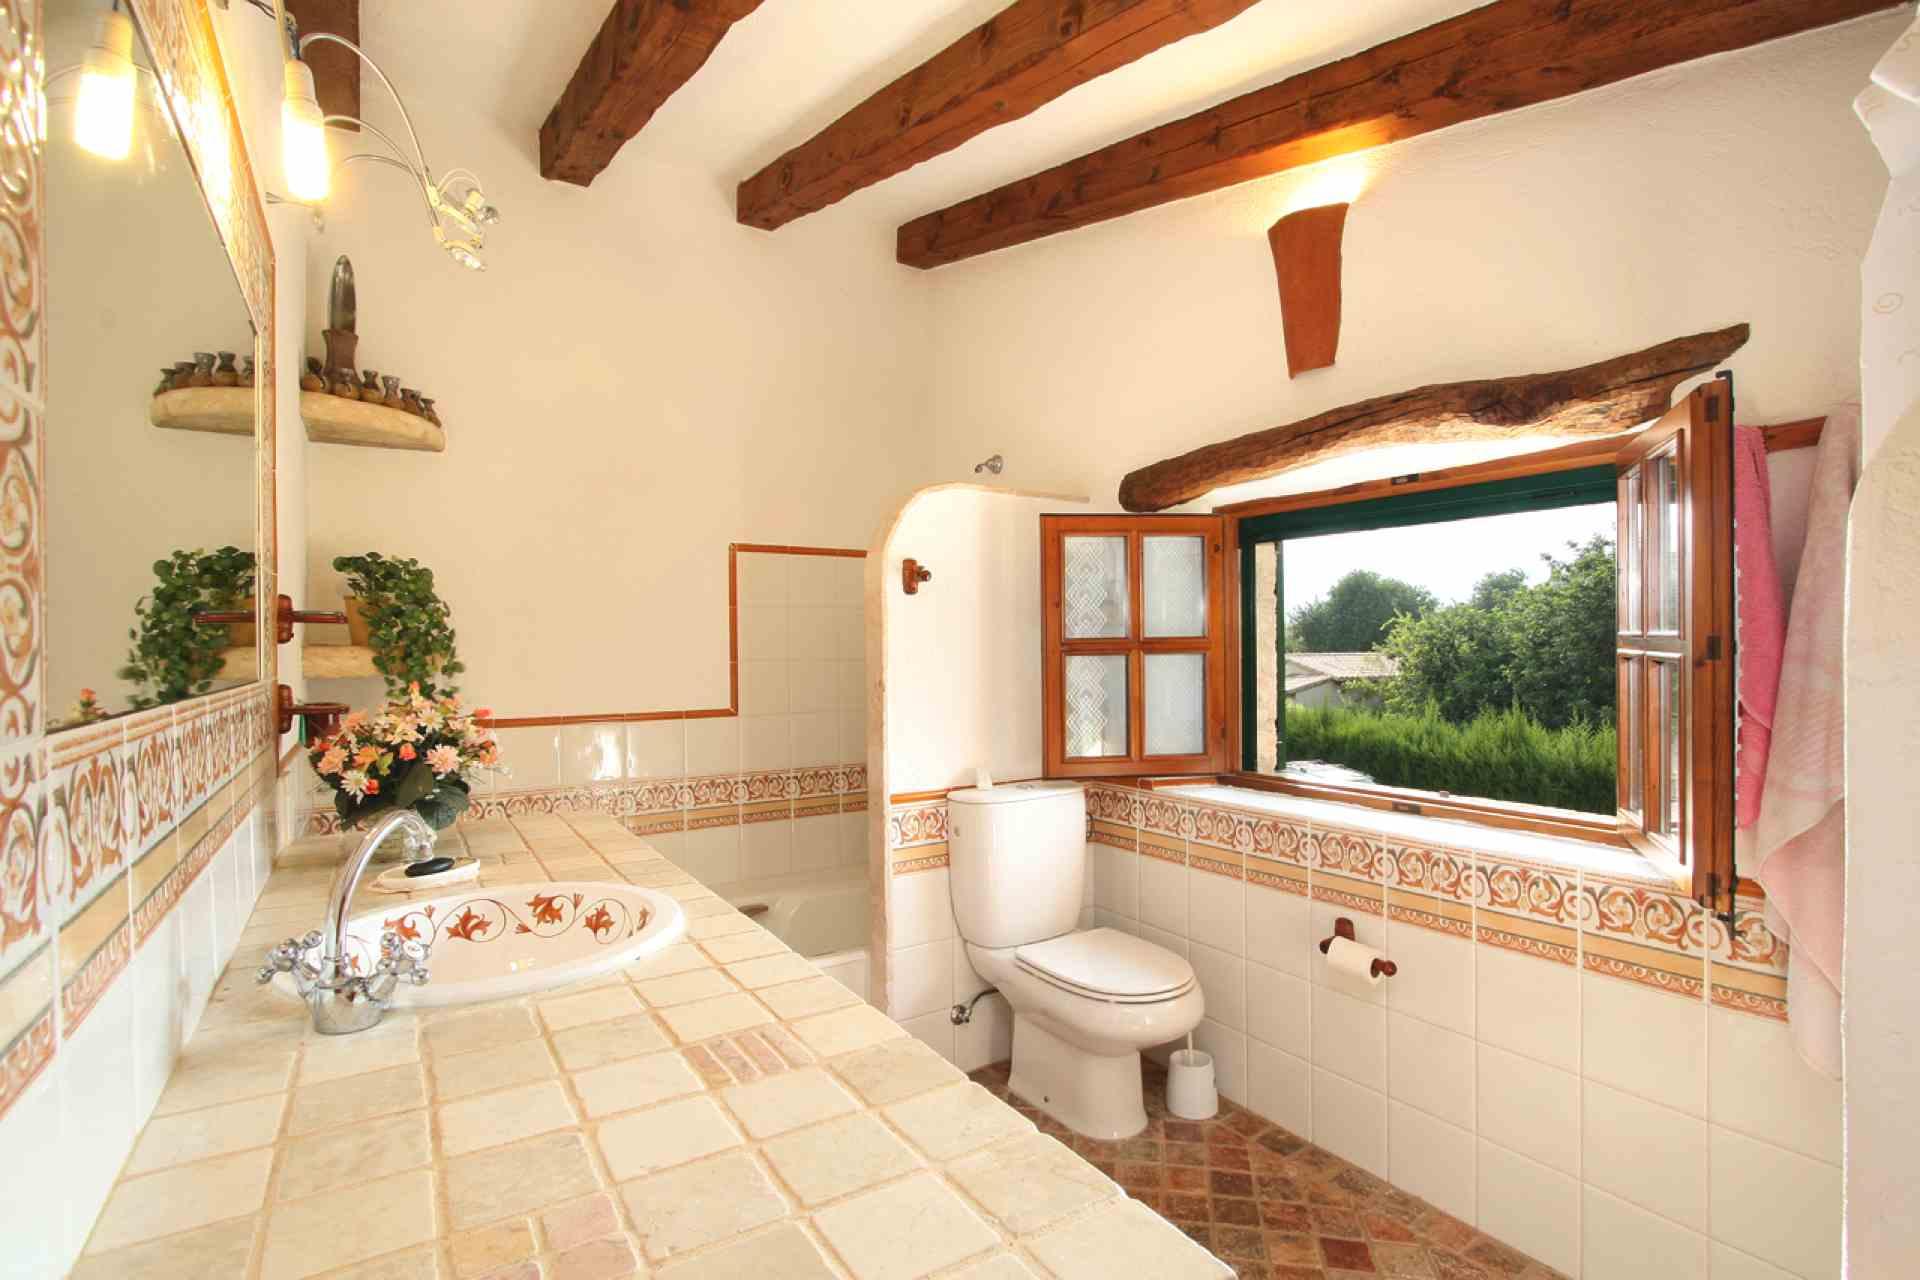 Romantische Badezimmer | Jtleigh.com - Hausgestaltung Ideen Badezimmer Romantisch